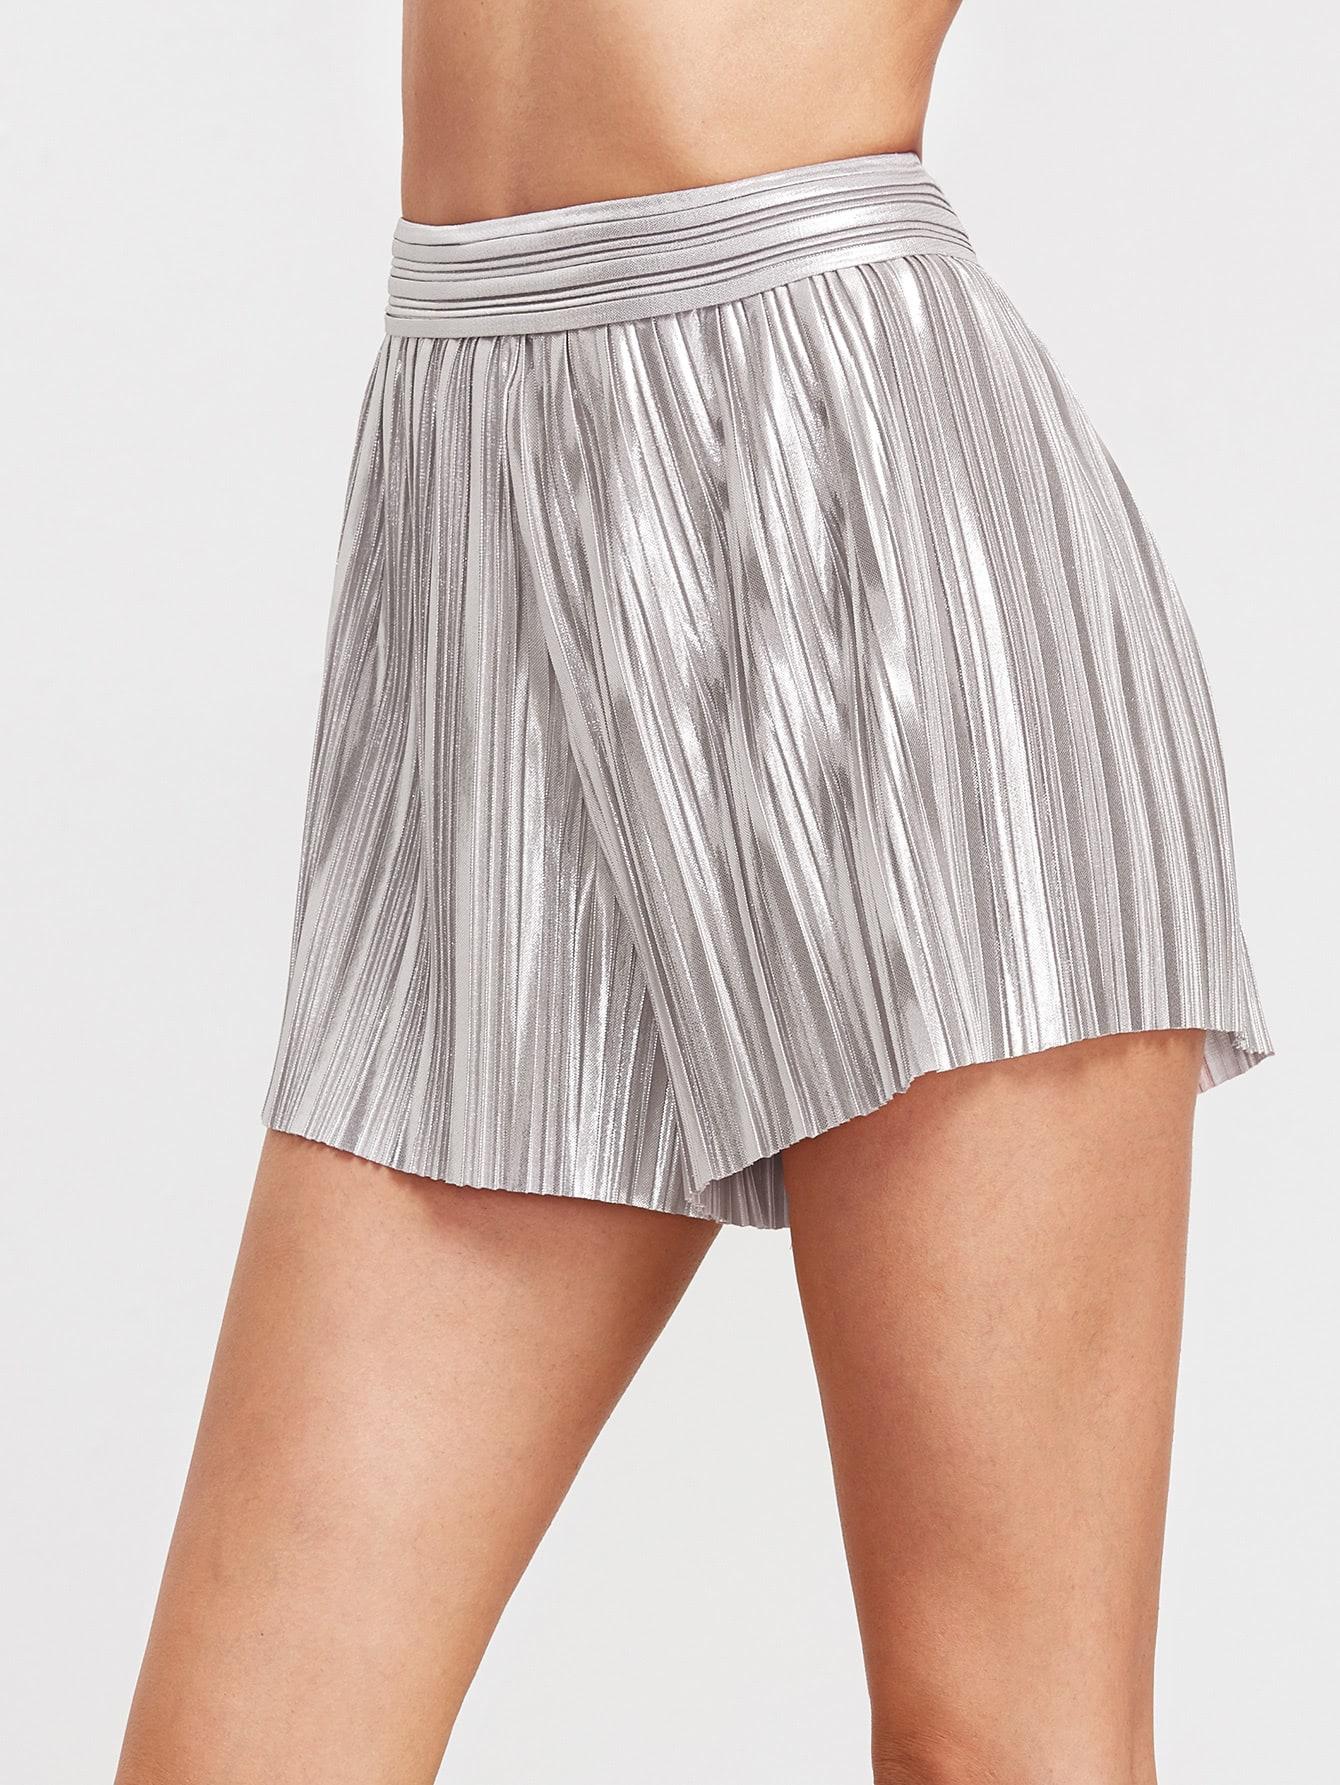 Фото Metallic Silver Elastic Waist Pleated Shorts. Купить с доставкой